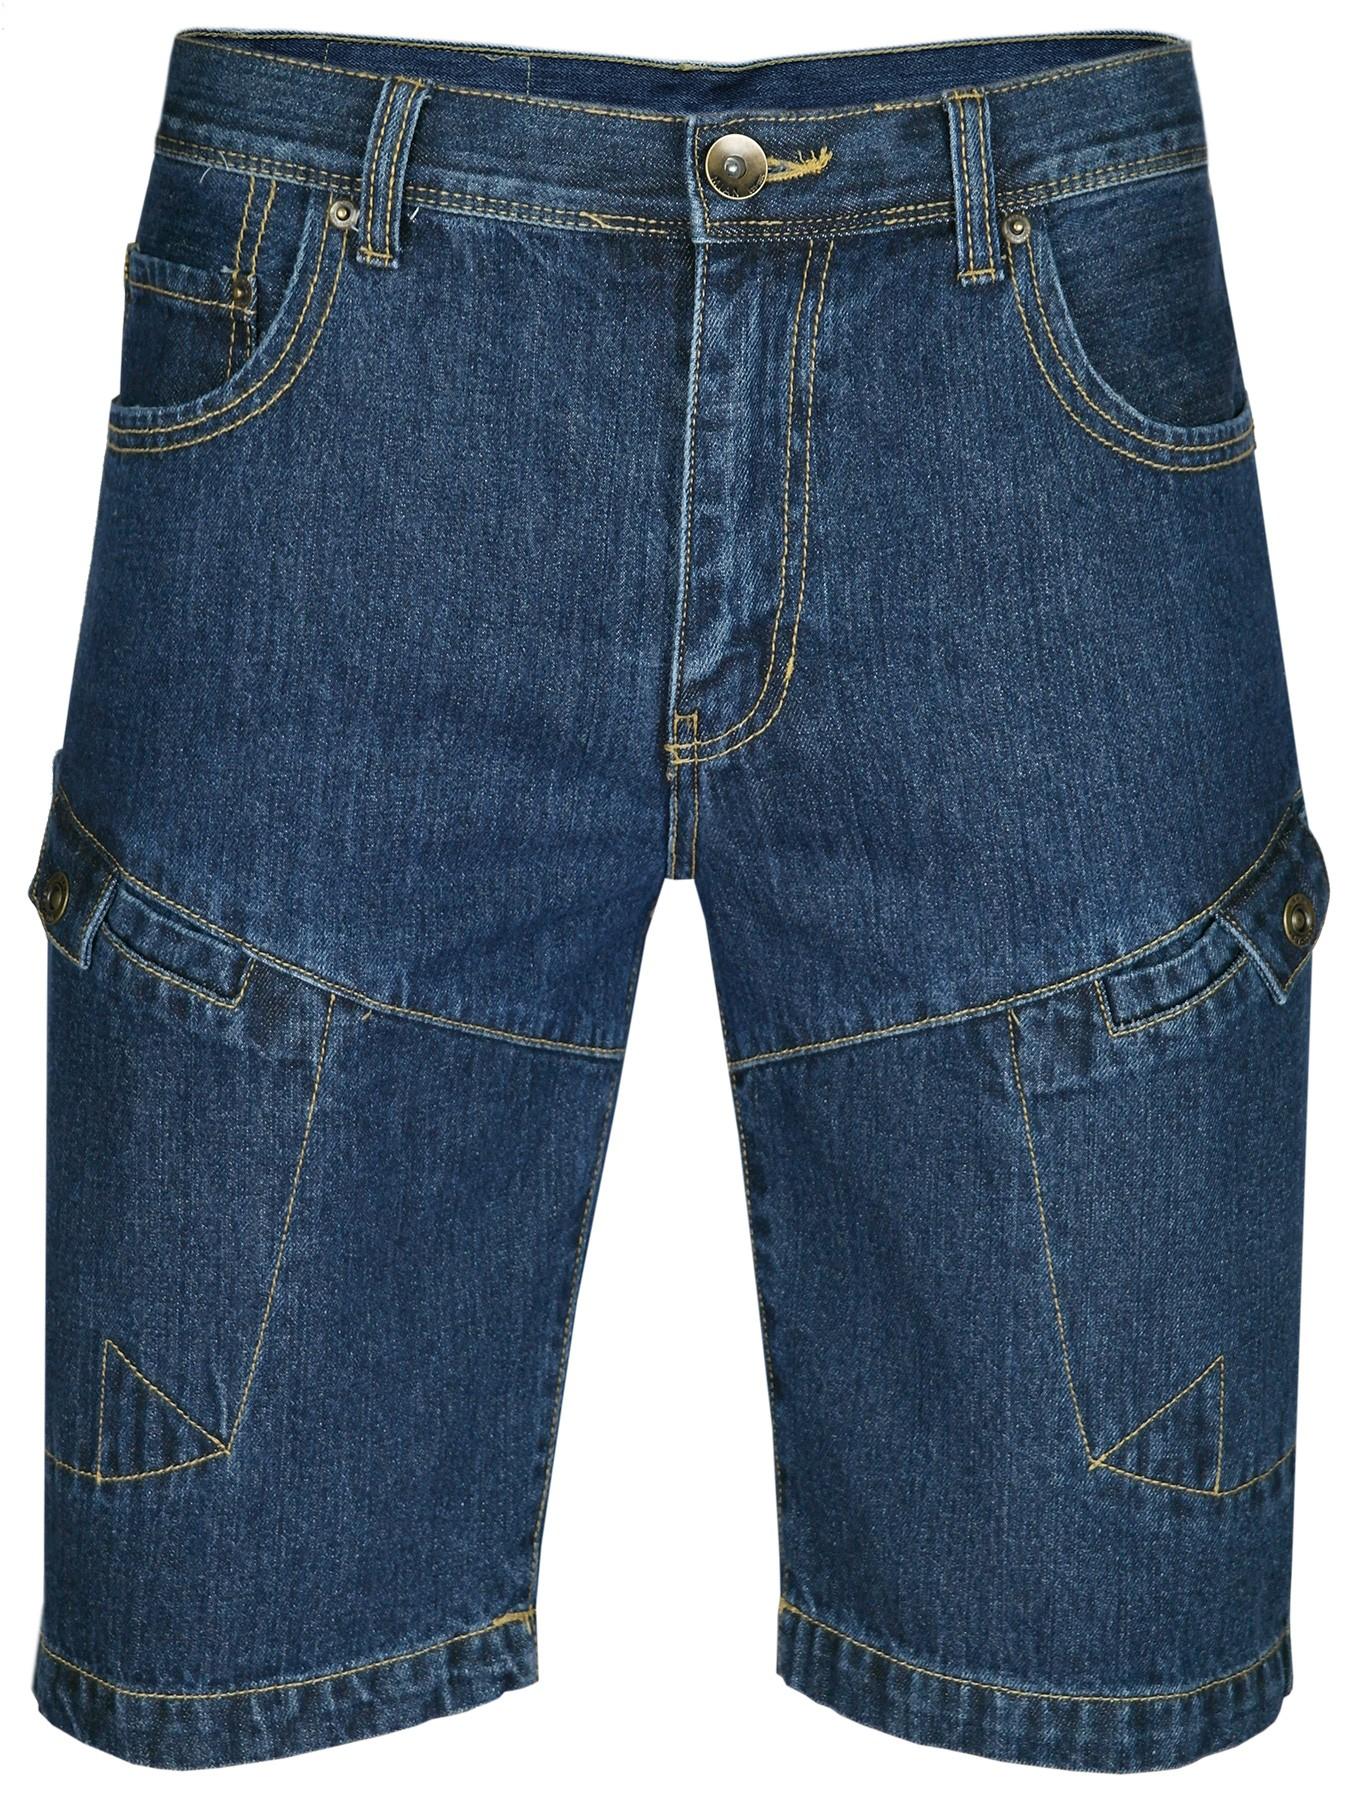 MIAN Denim Herren Shorts Jeans-Shorts 100% Baumwolle DarkBlue